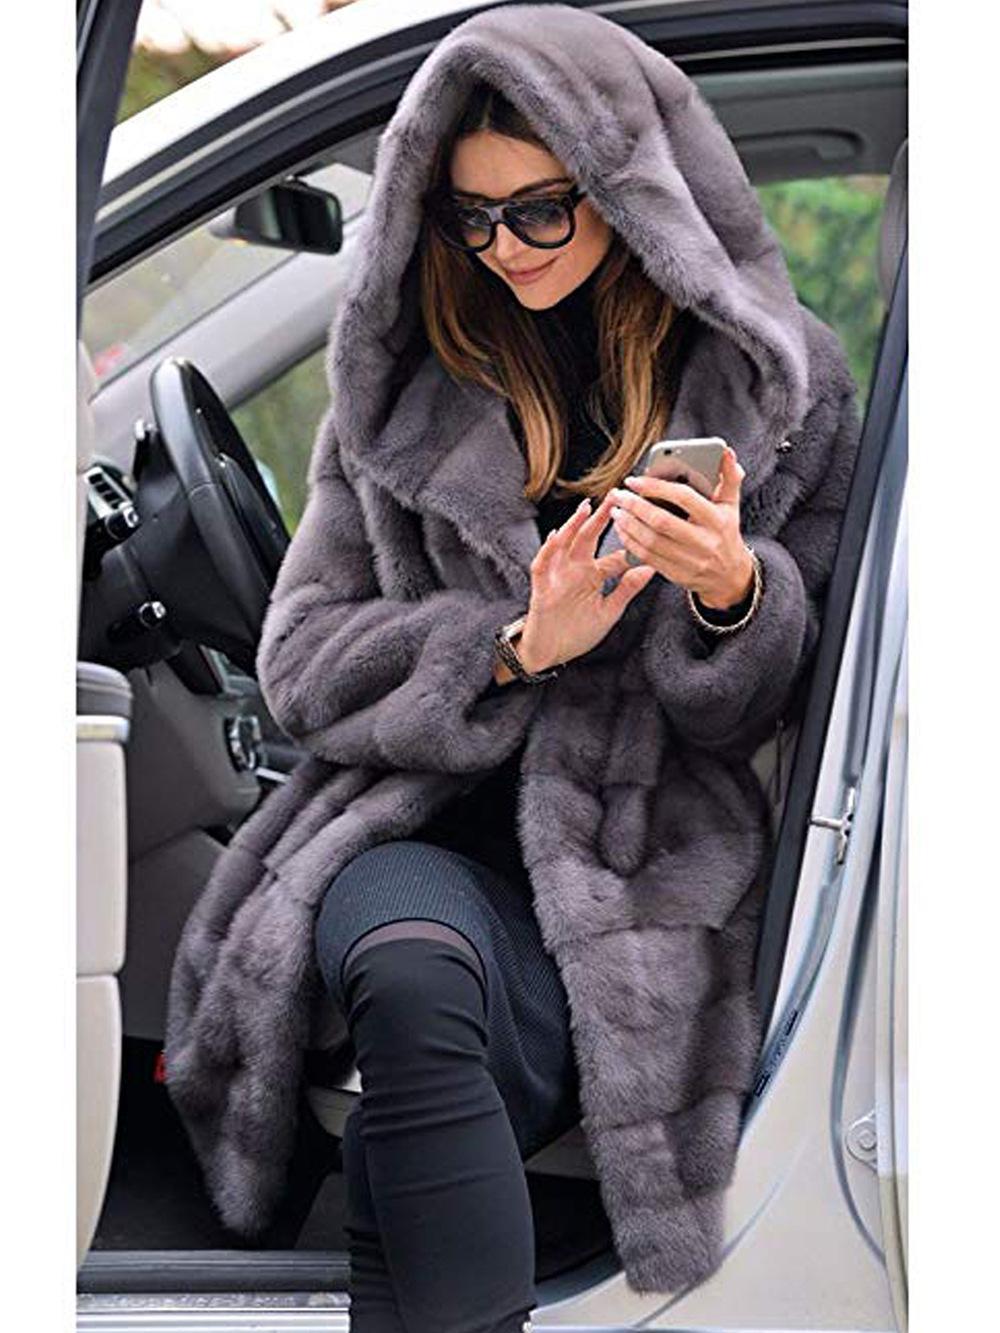 New Woman Fur 90cm Plus Size Women Clothing Winter Artificial Economy Mink Fur Coat With A Hood Luxury Fake Fur Coats